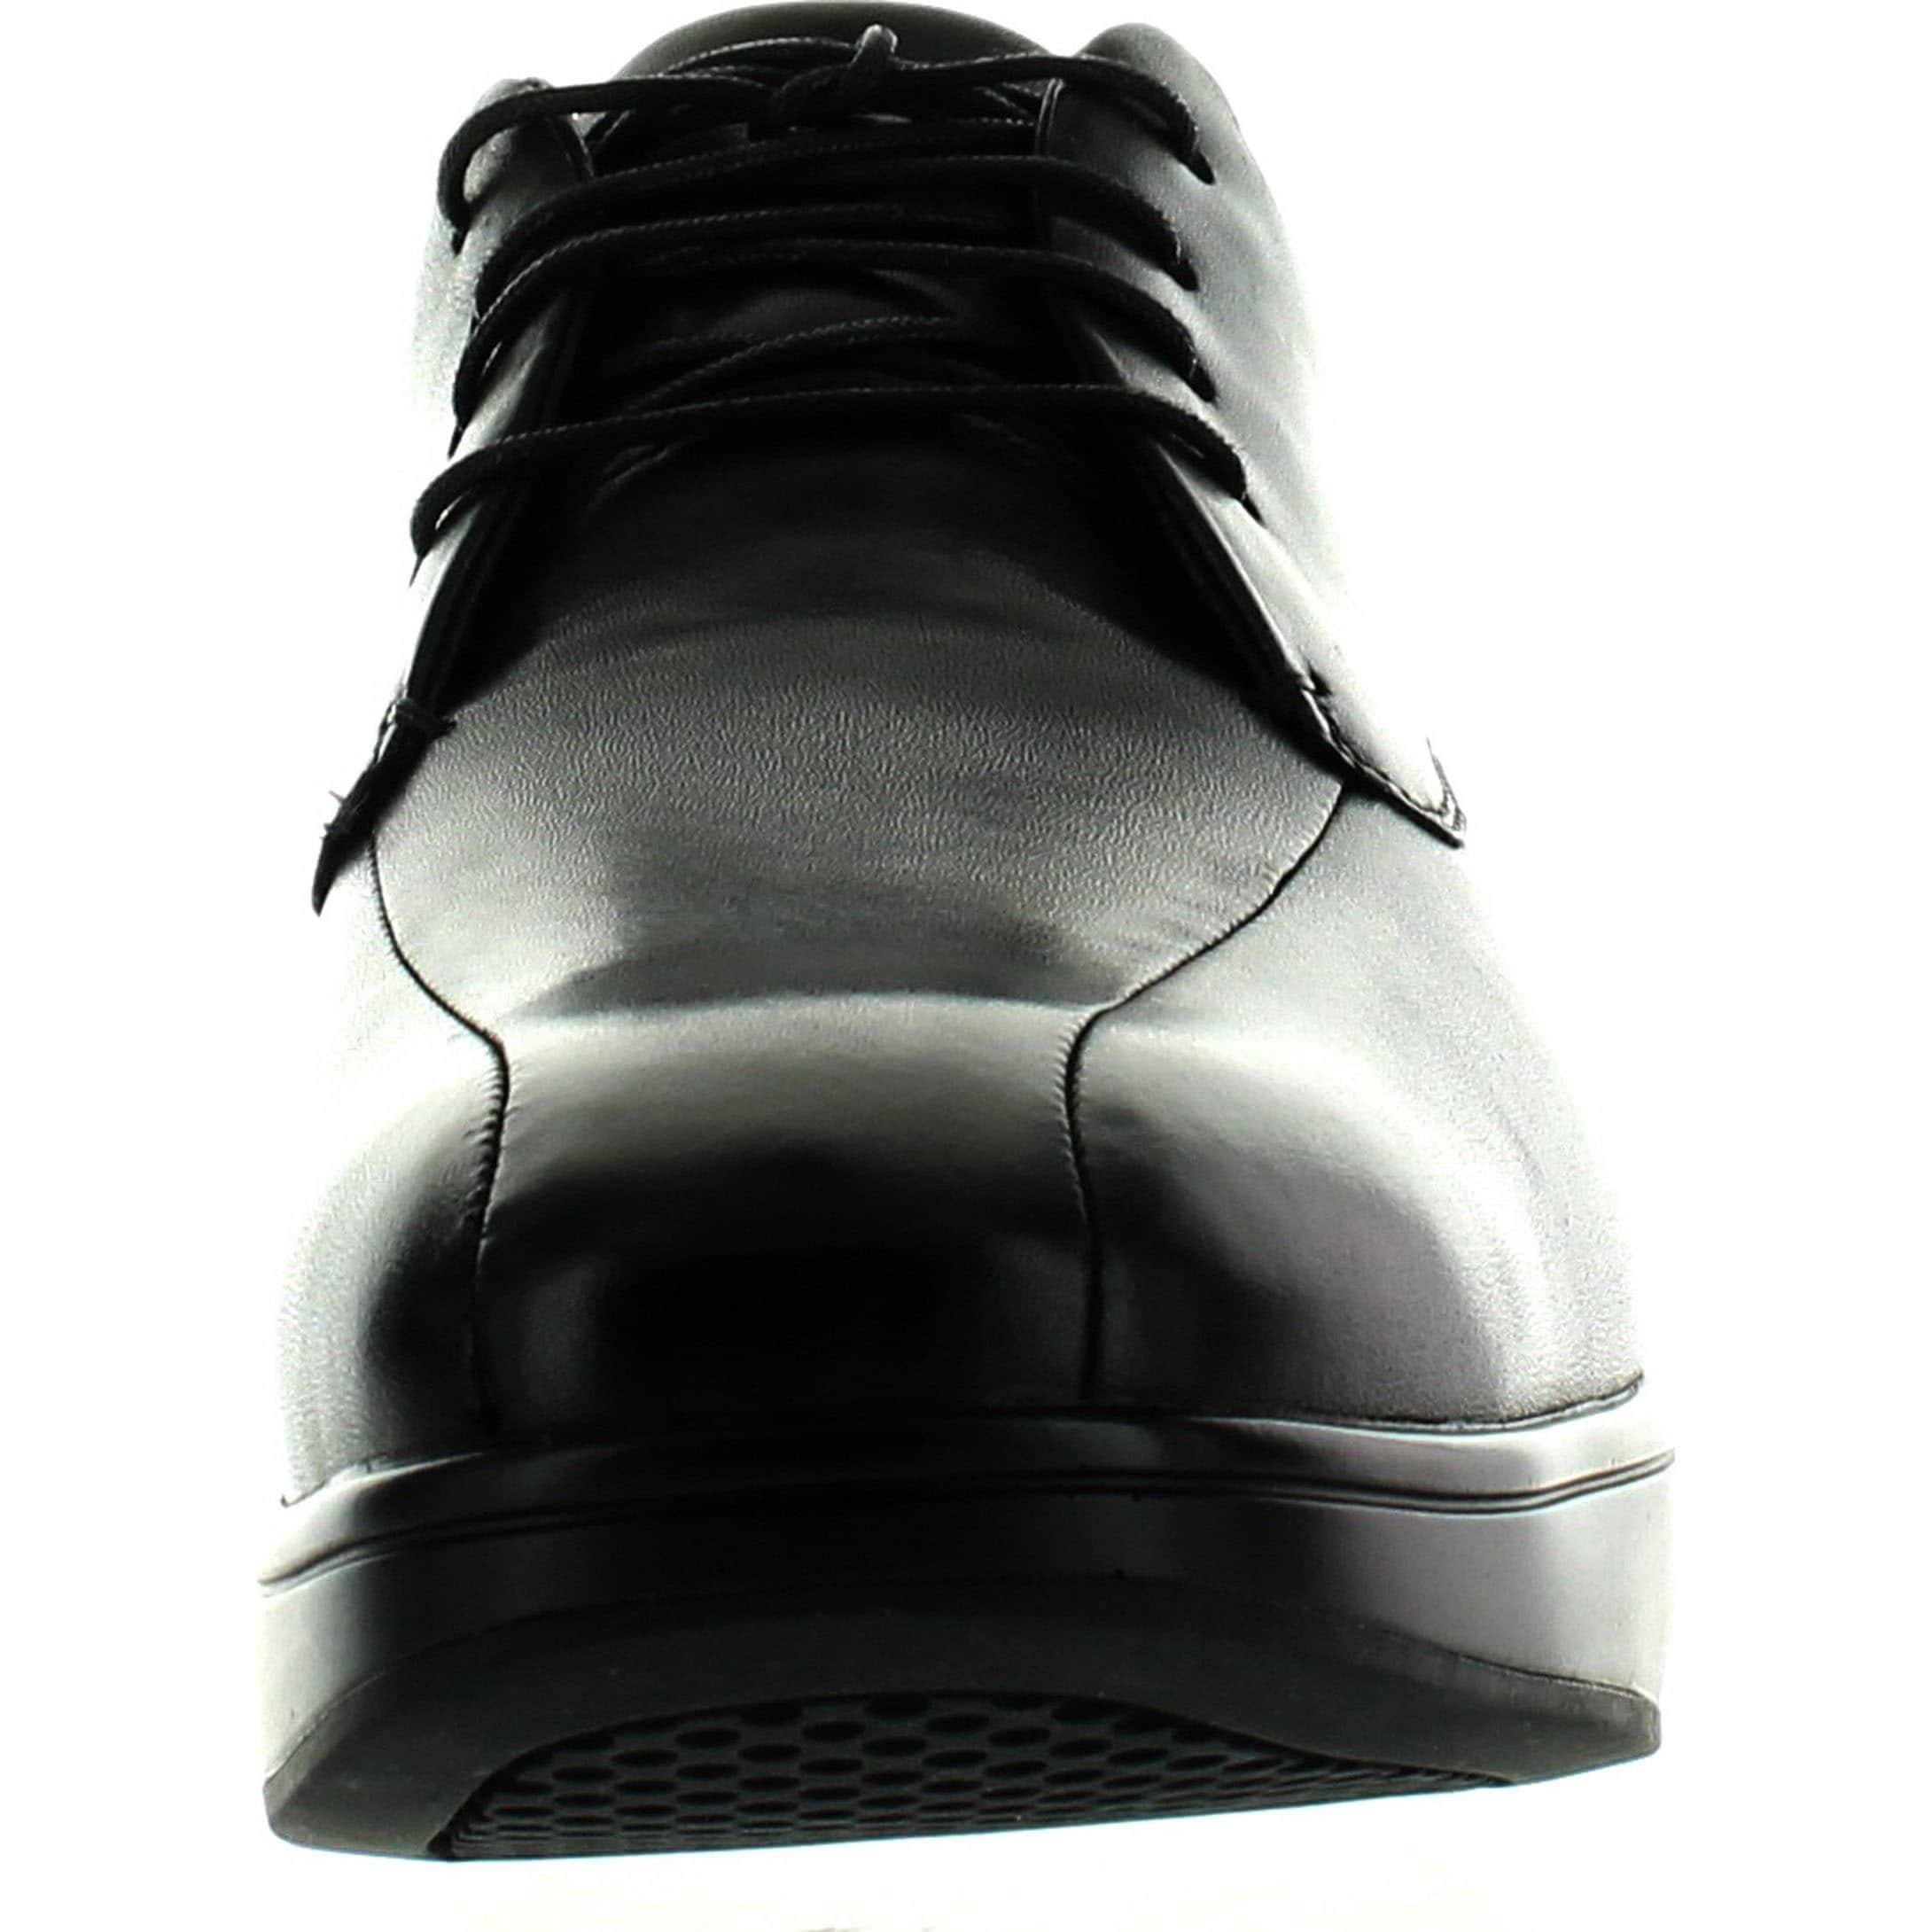 7e9635ca28 Shop Mbt Mens Bosi Laceup Shoes - Black - 39 m eu - Free Shipping Today -  Overstock.com - 14661524